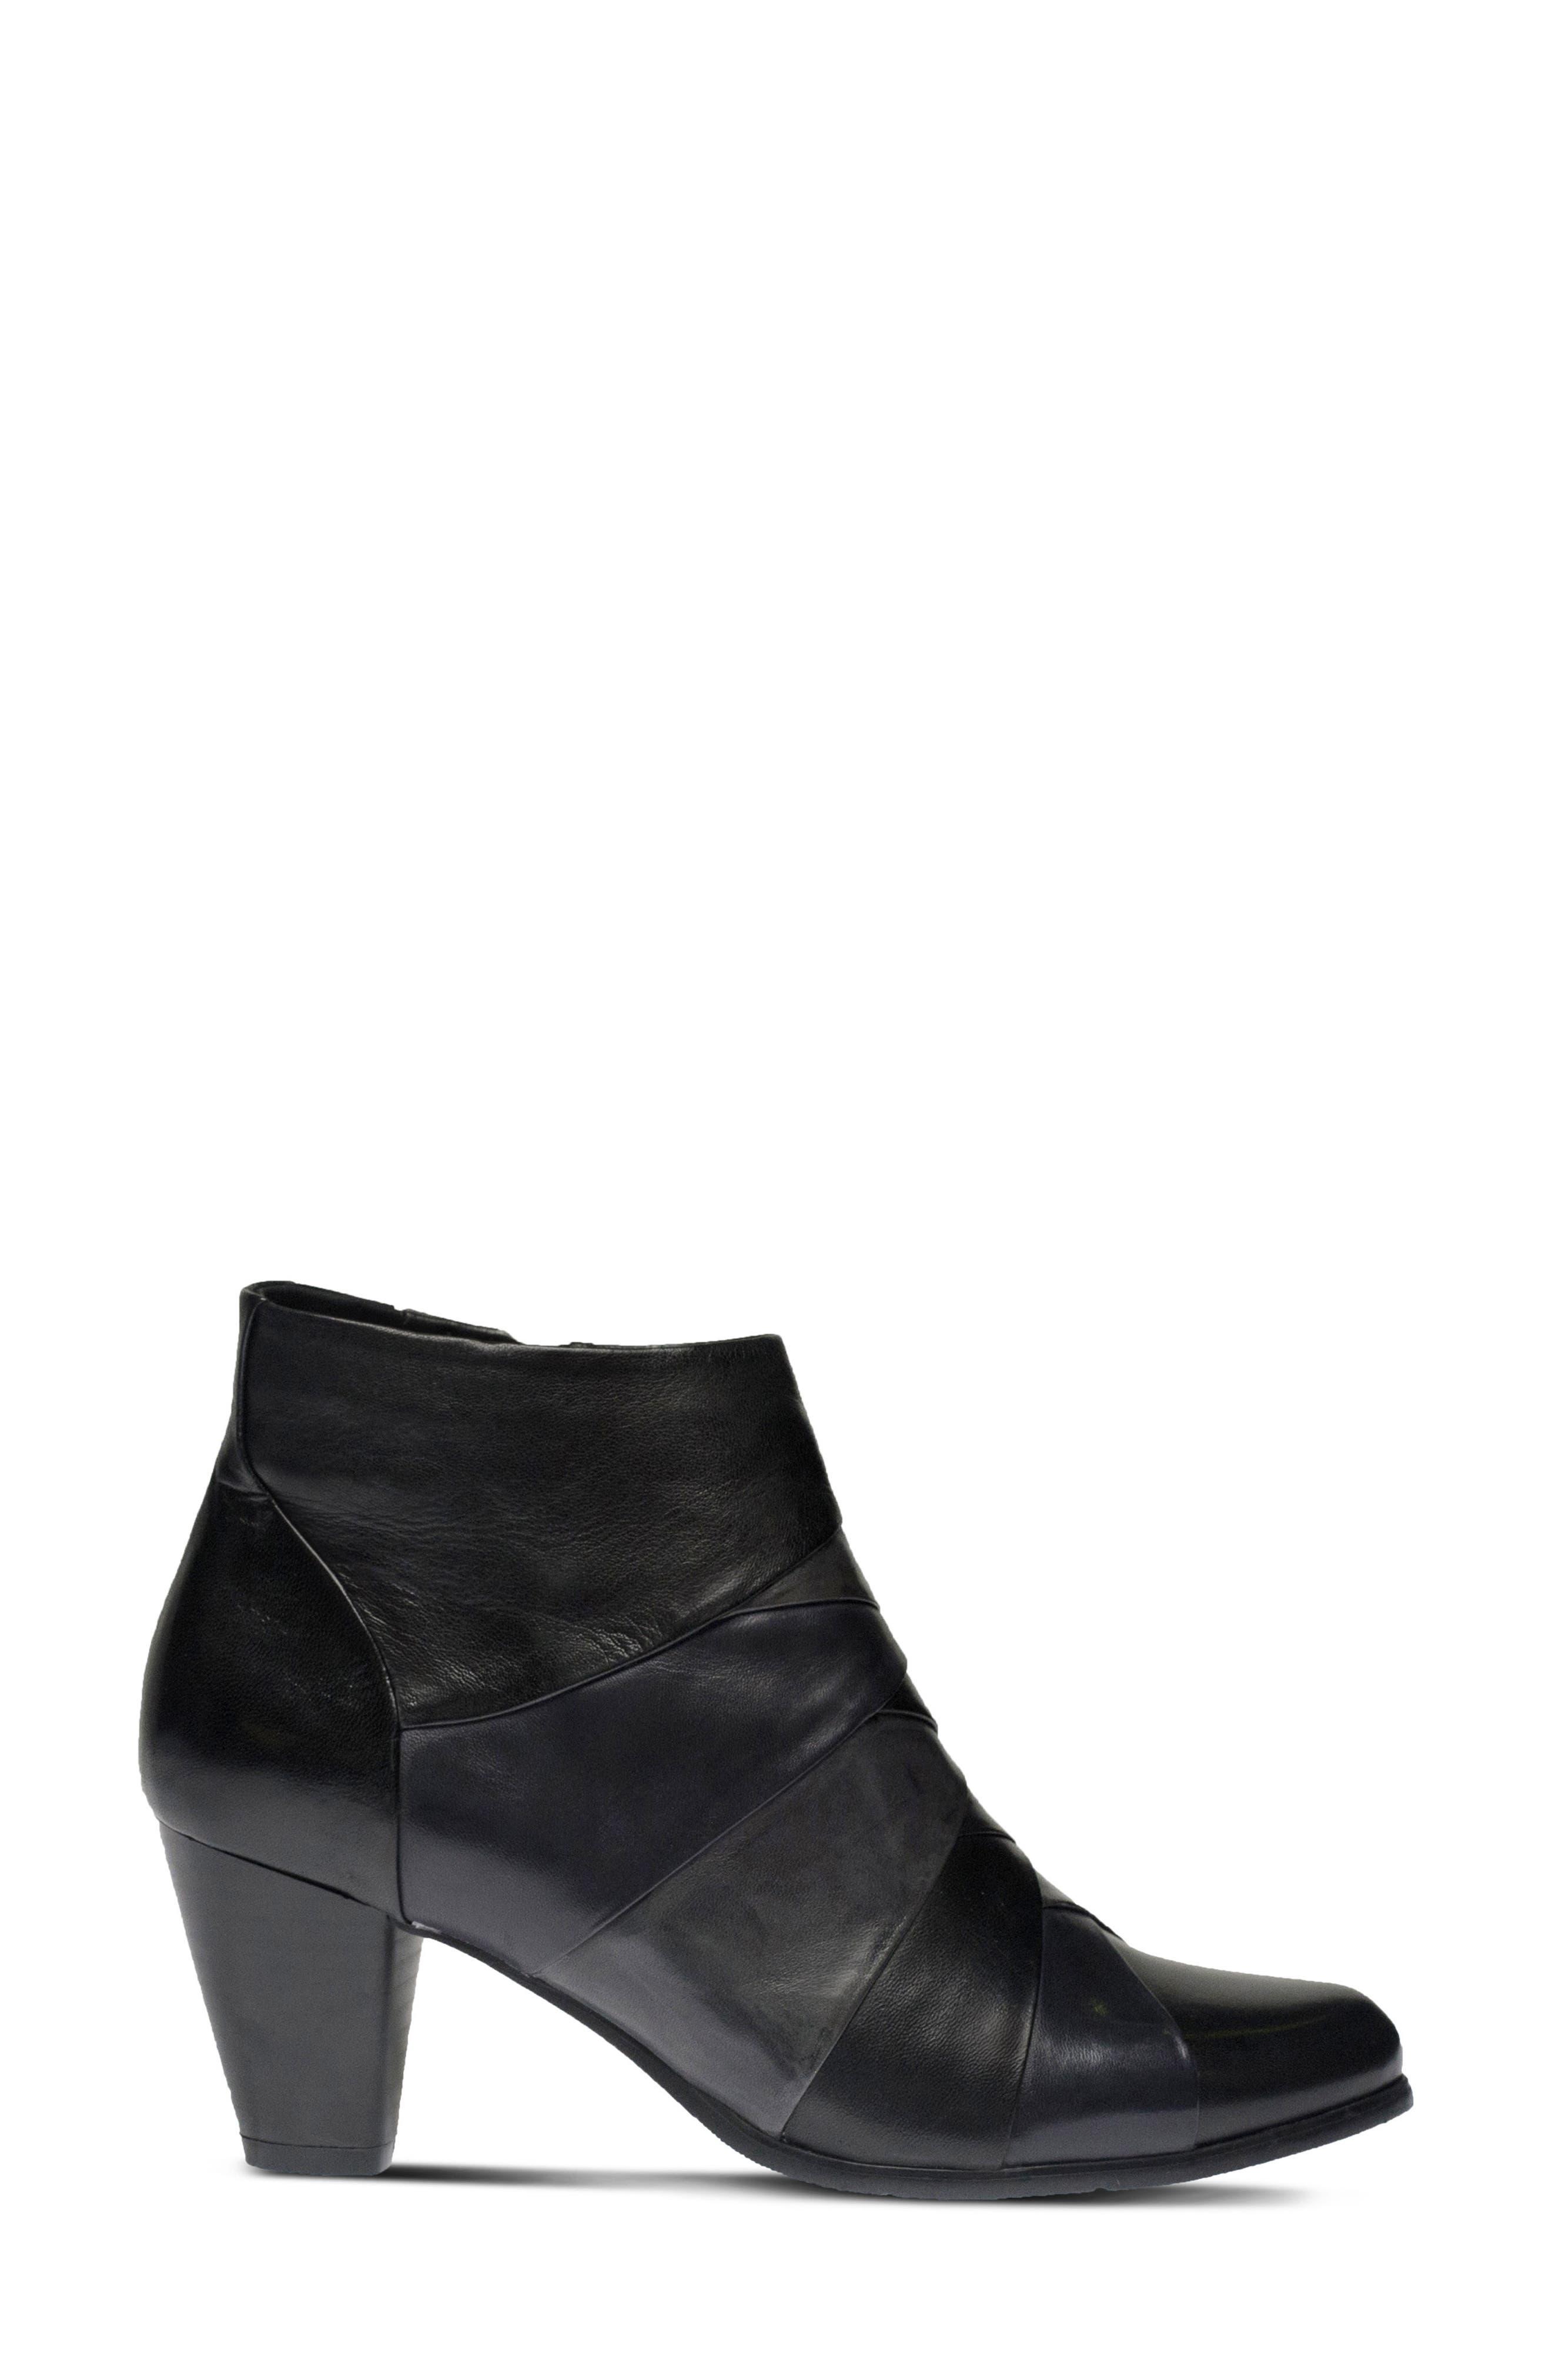 Binzo Bootie,                             Alternate thumbnail 3, color,                             Black Multi Leather